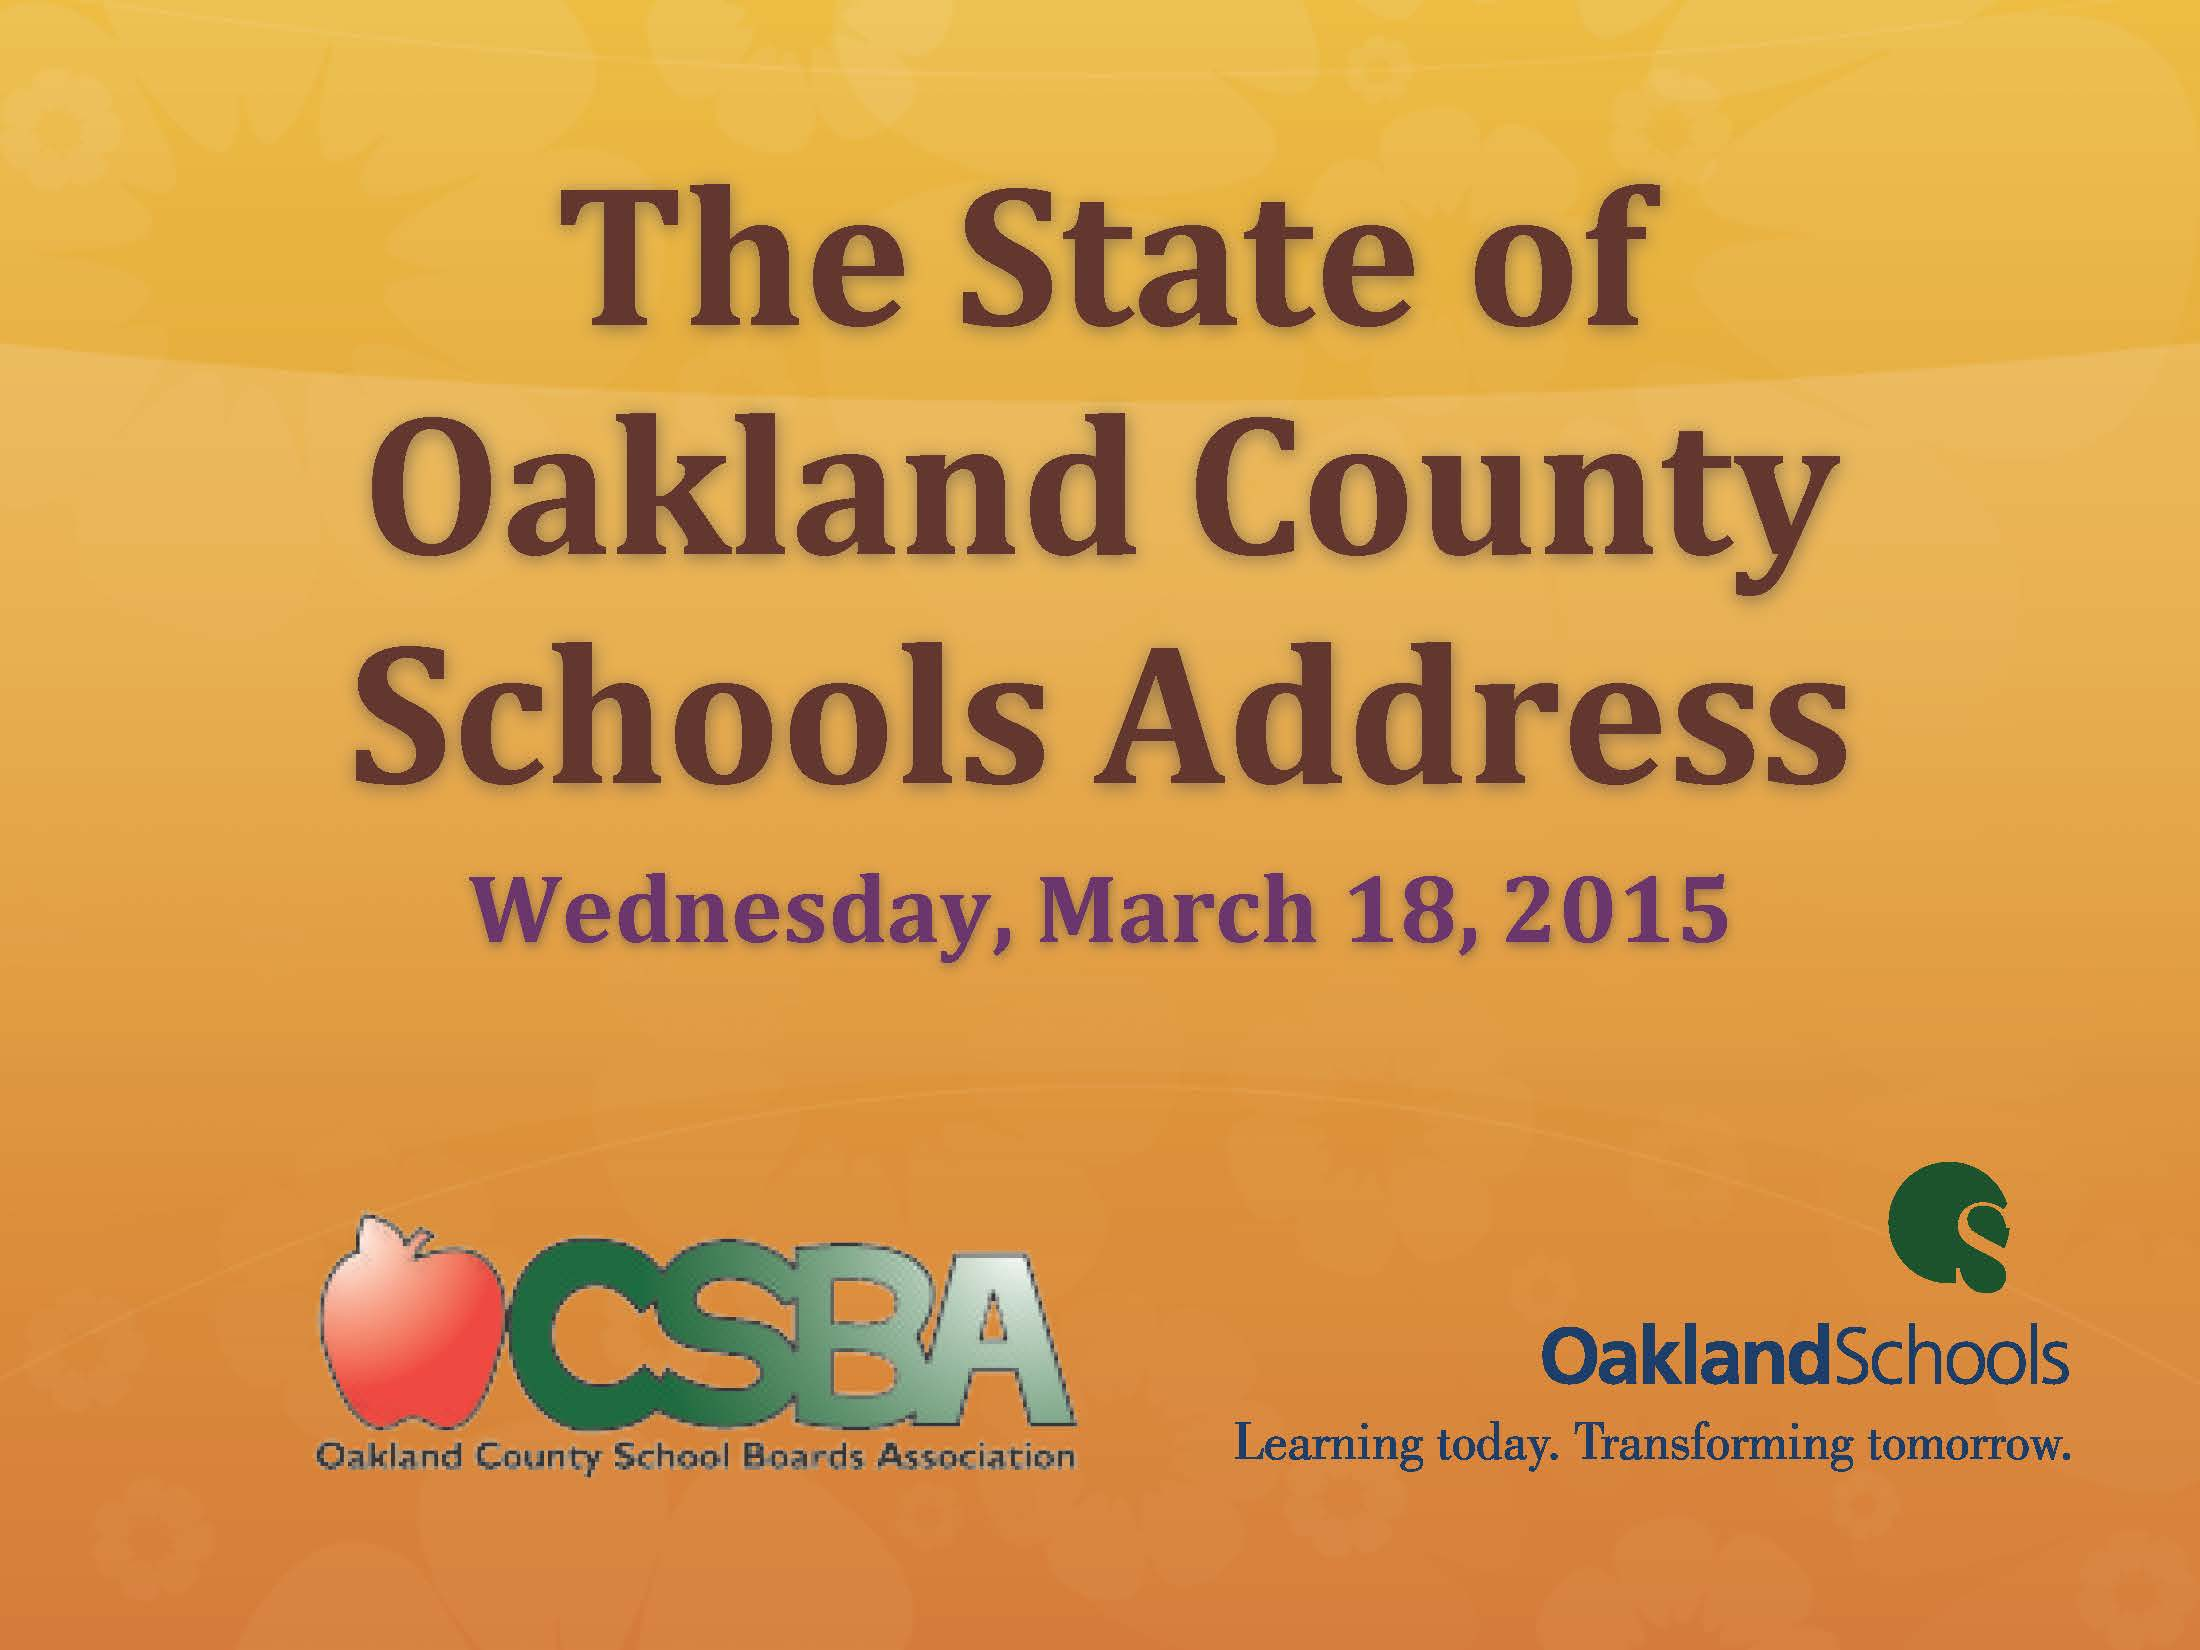 Oakland Schools